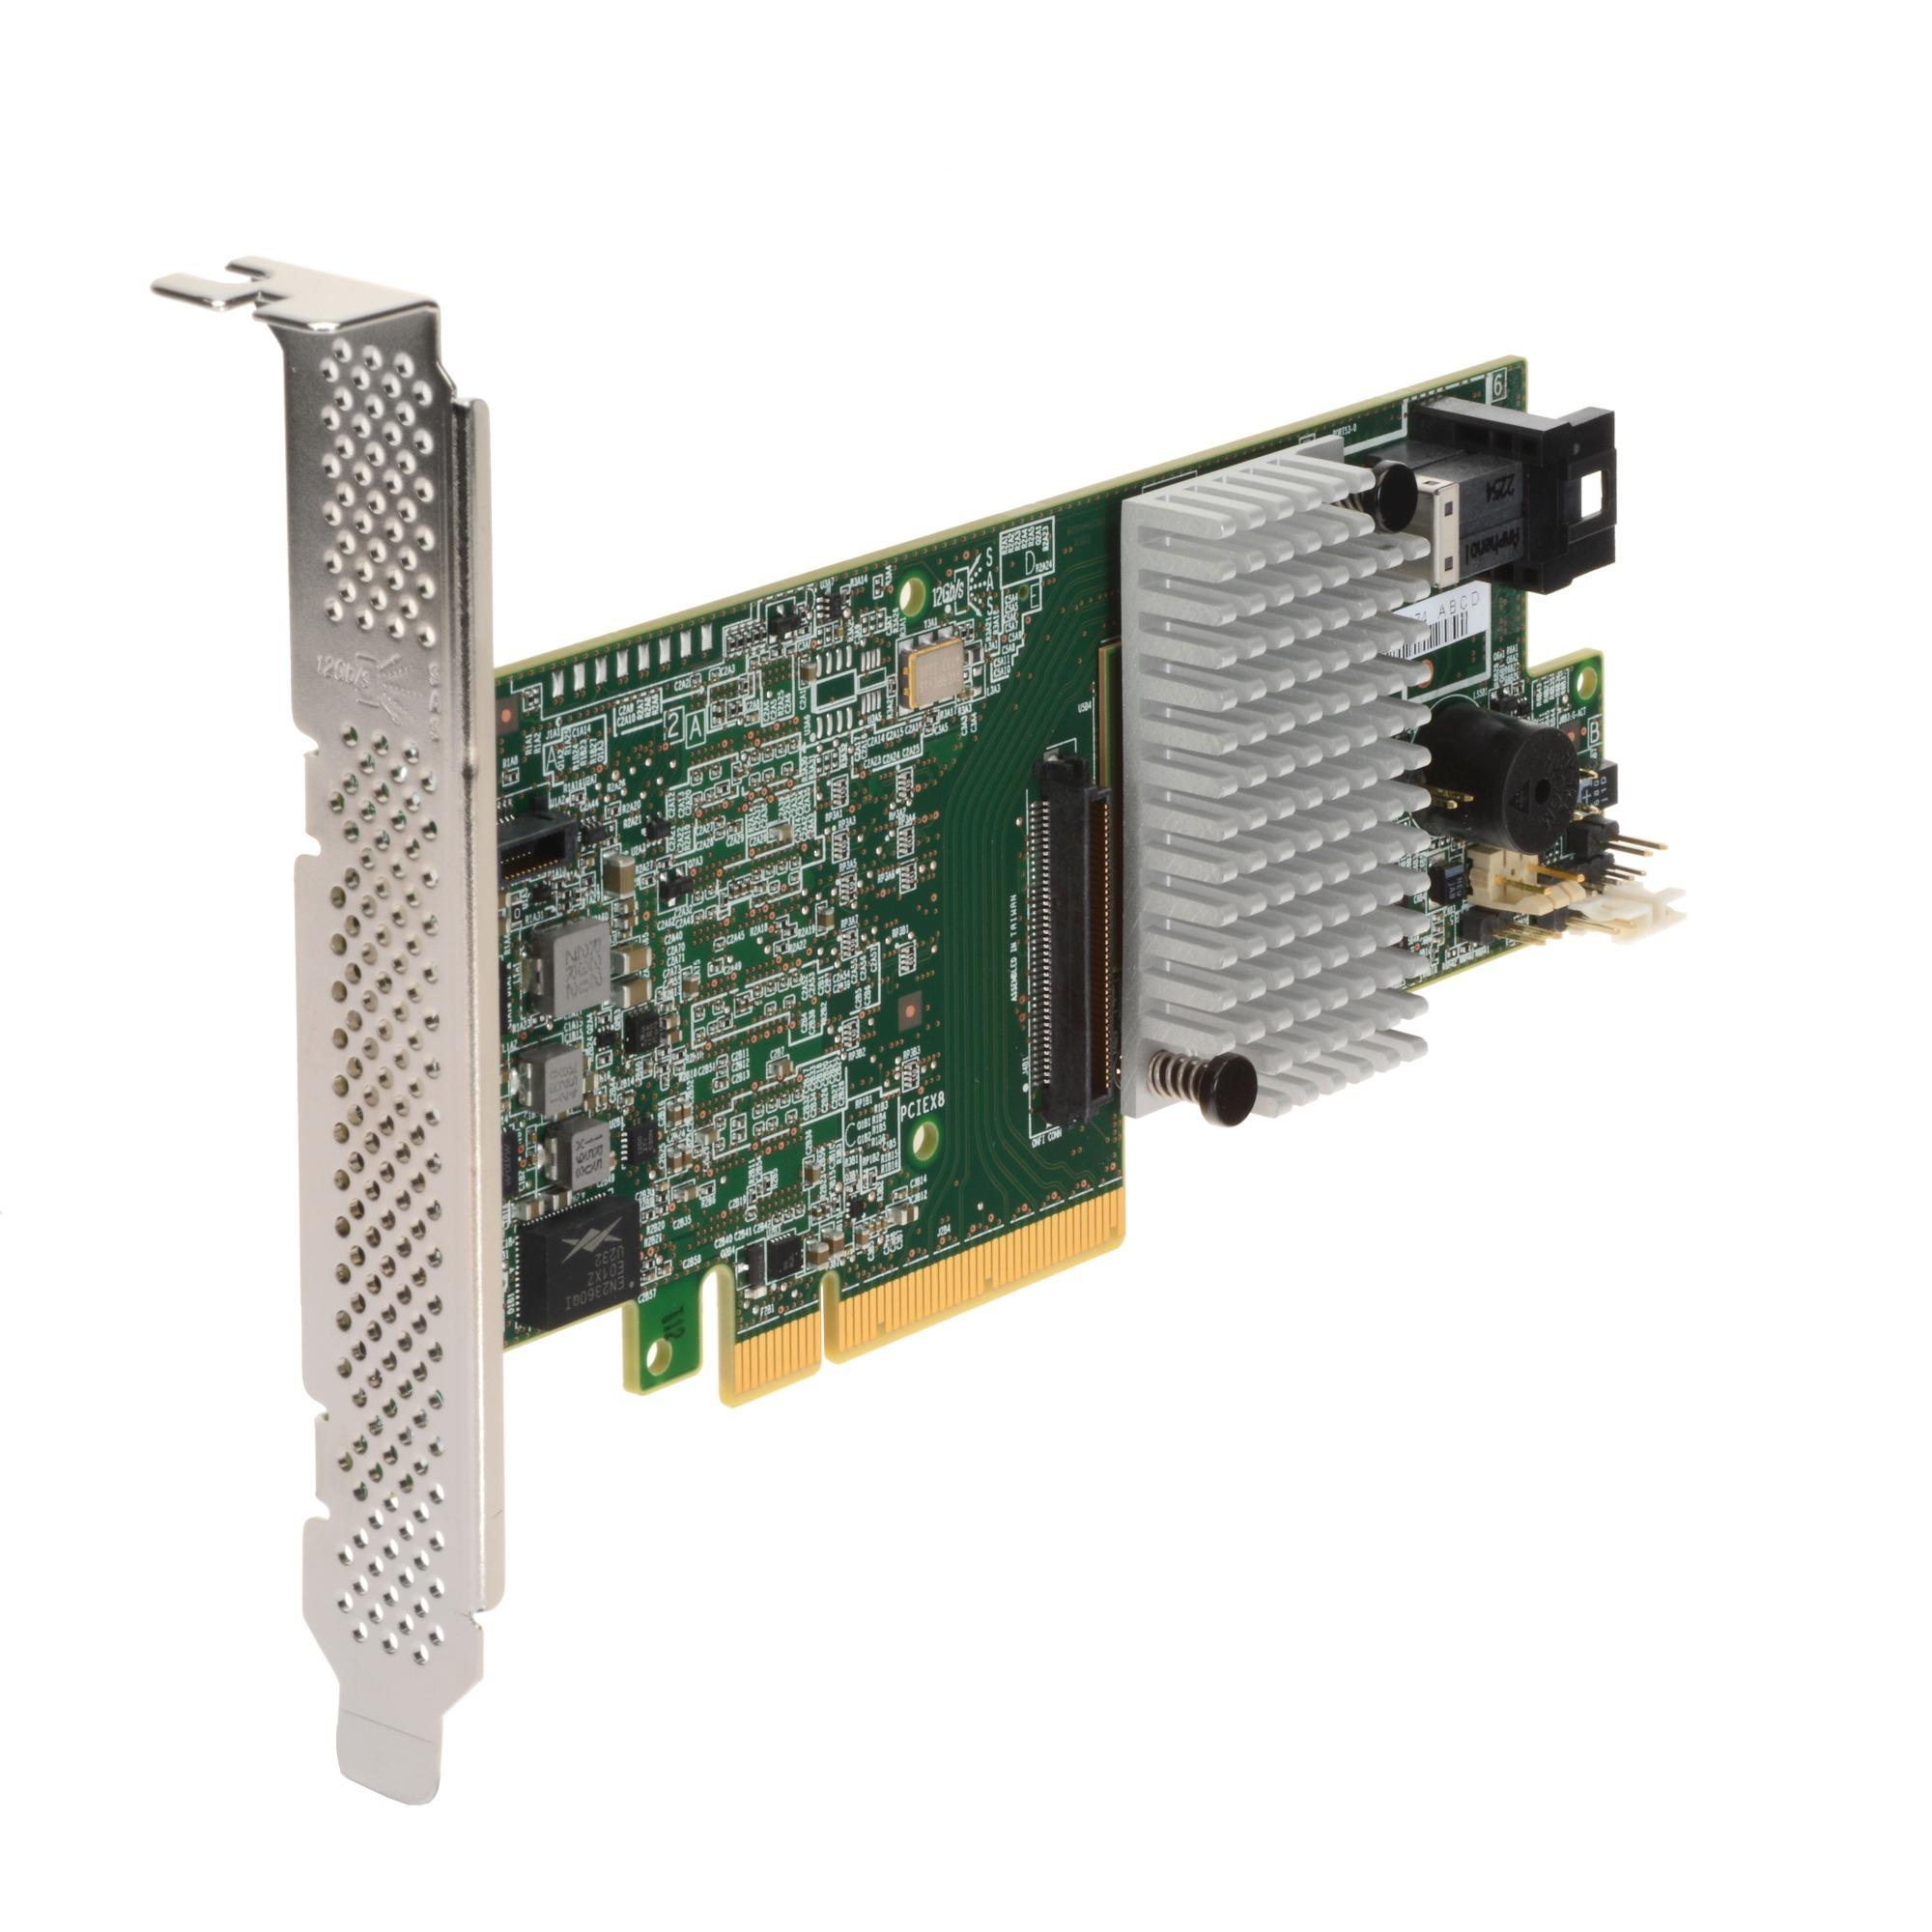 MegaRAID SAS 9361-4i PCI Express x8 12Gbit/s controlado RAID, Controlador